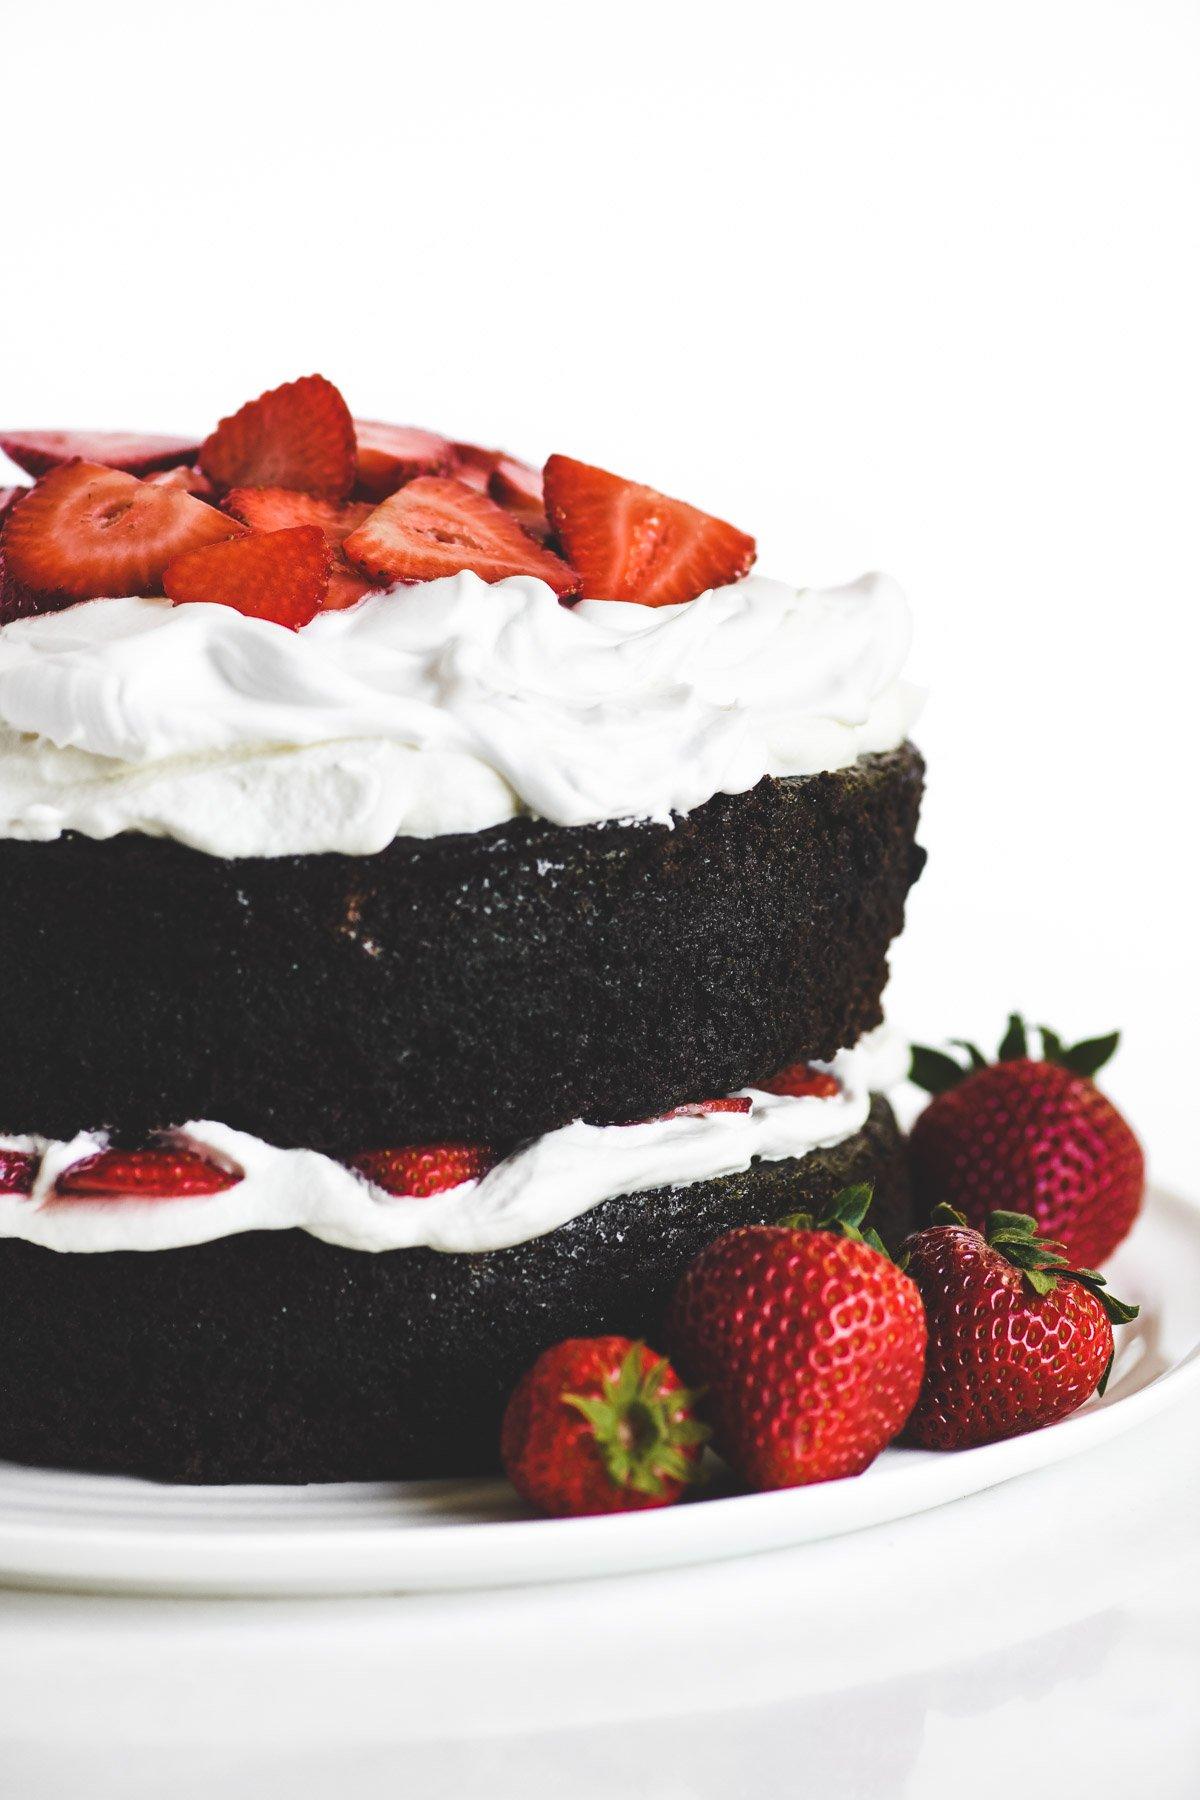 chocolate Strawberry Whipped Cream Cake with fresh berries